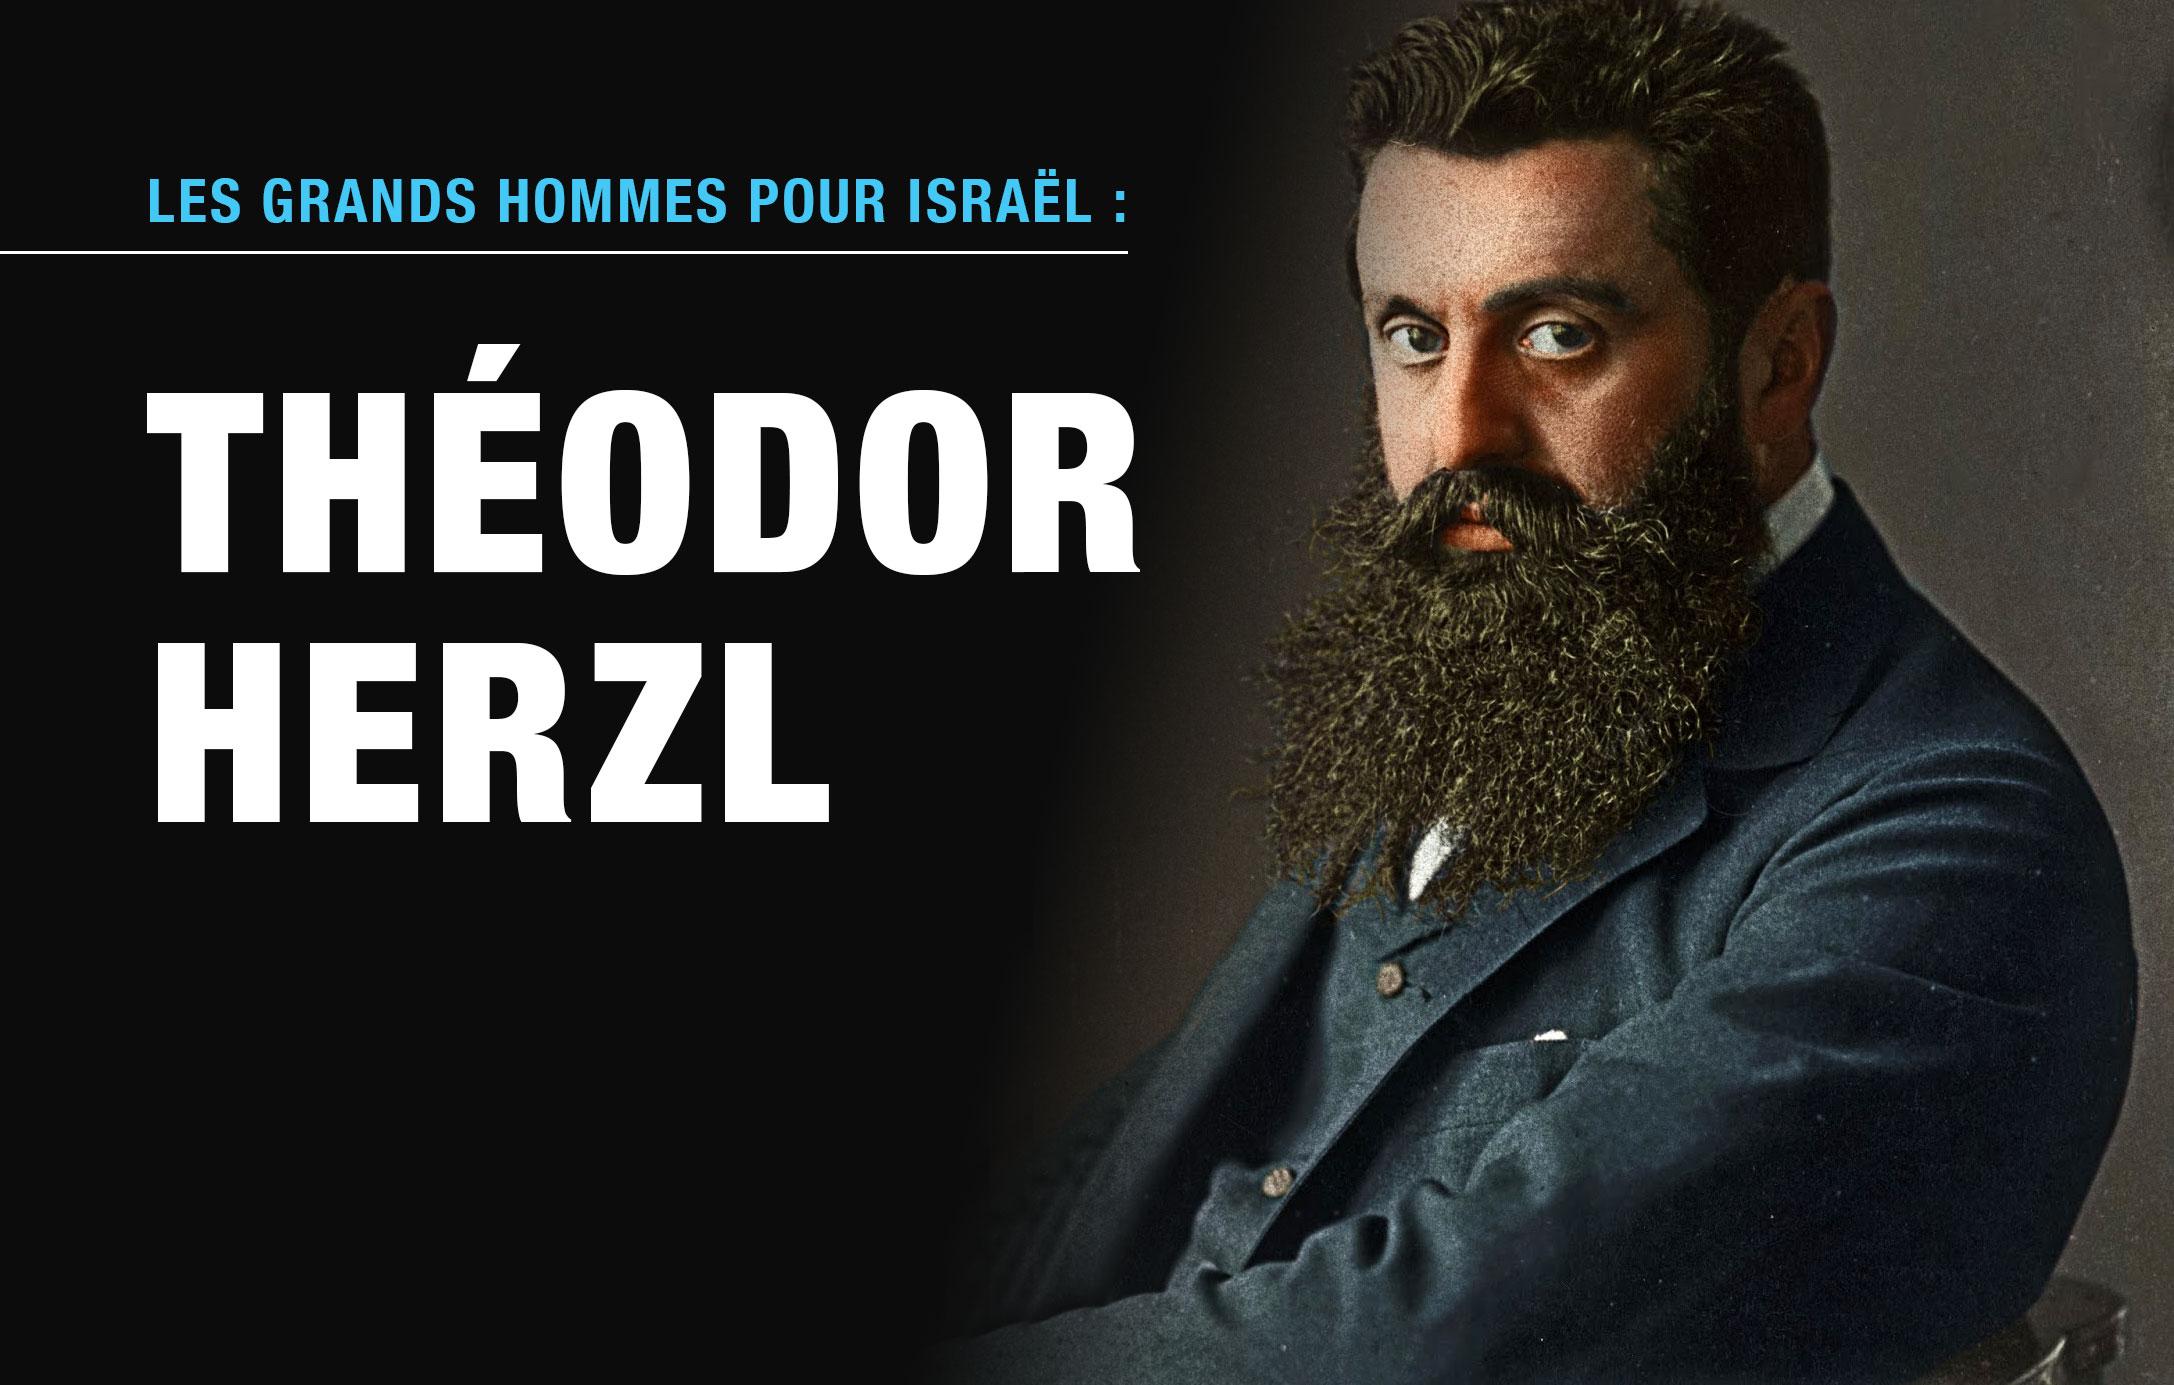 Les grands hommes pour Israël : Théodor Herzl